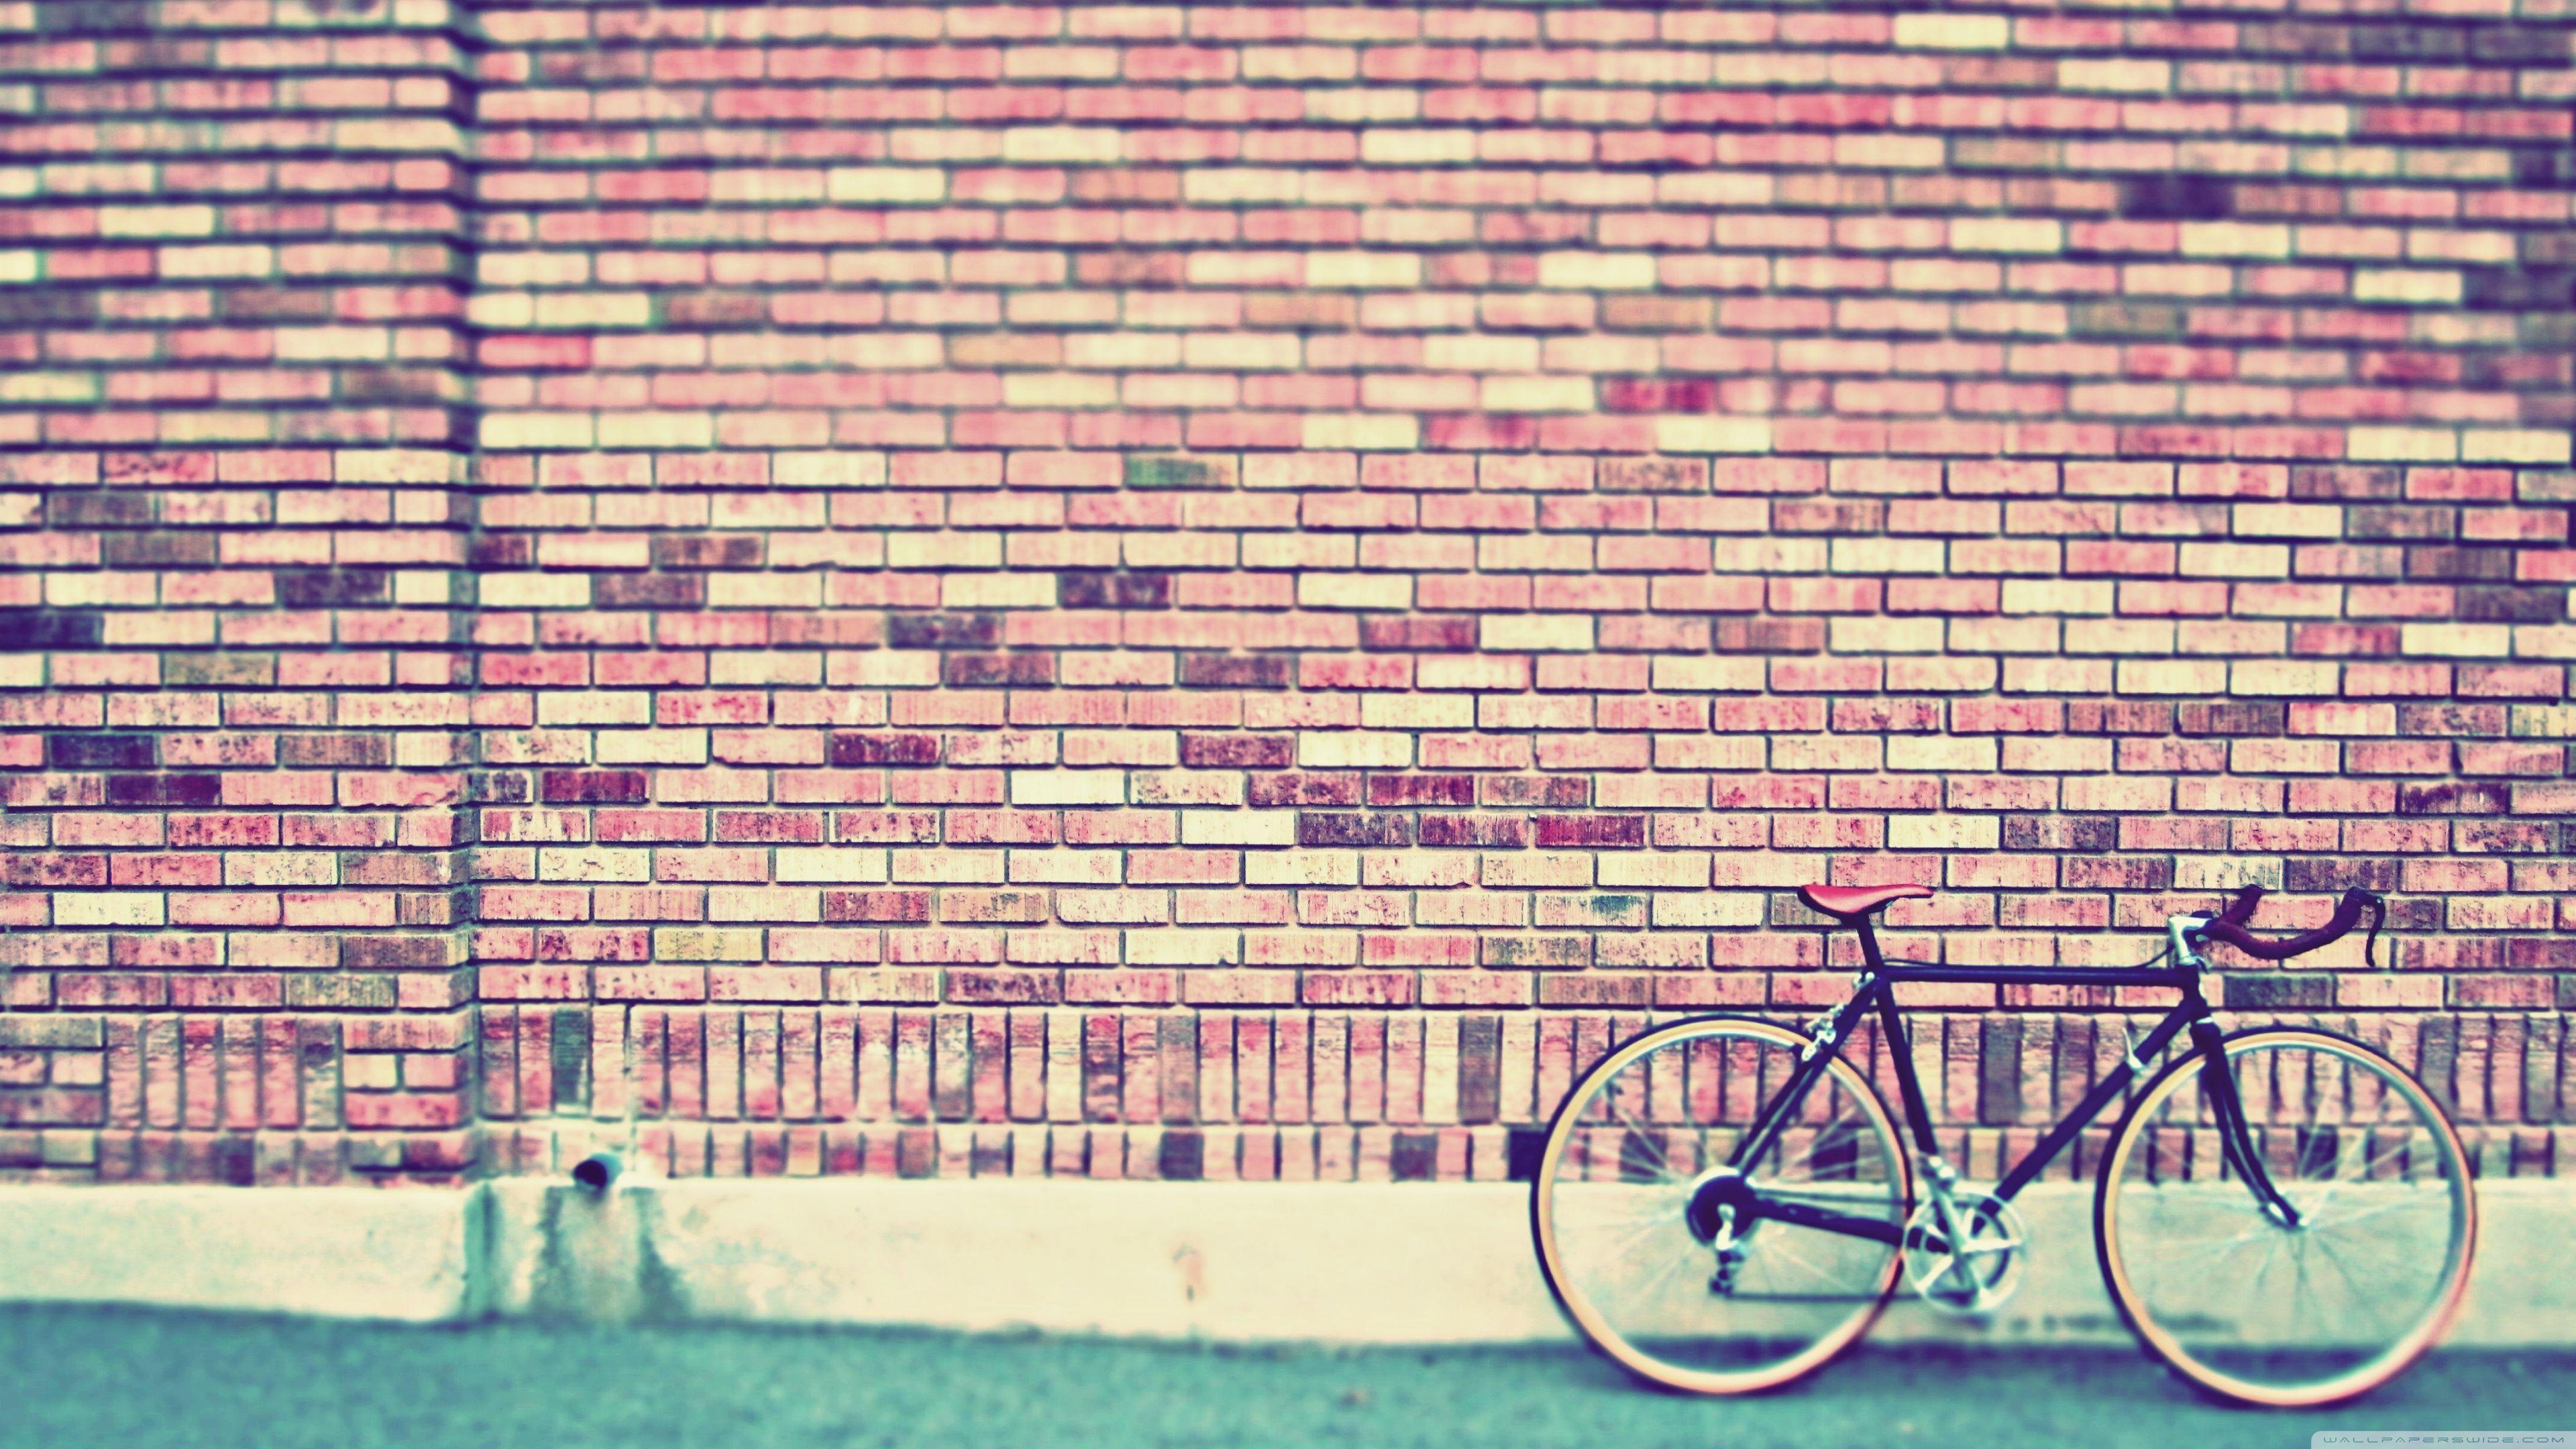 Vintage Bike Hd Desktop Wallpaper Widescreen Fullscreen